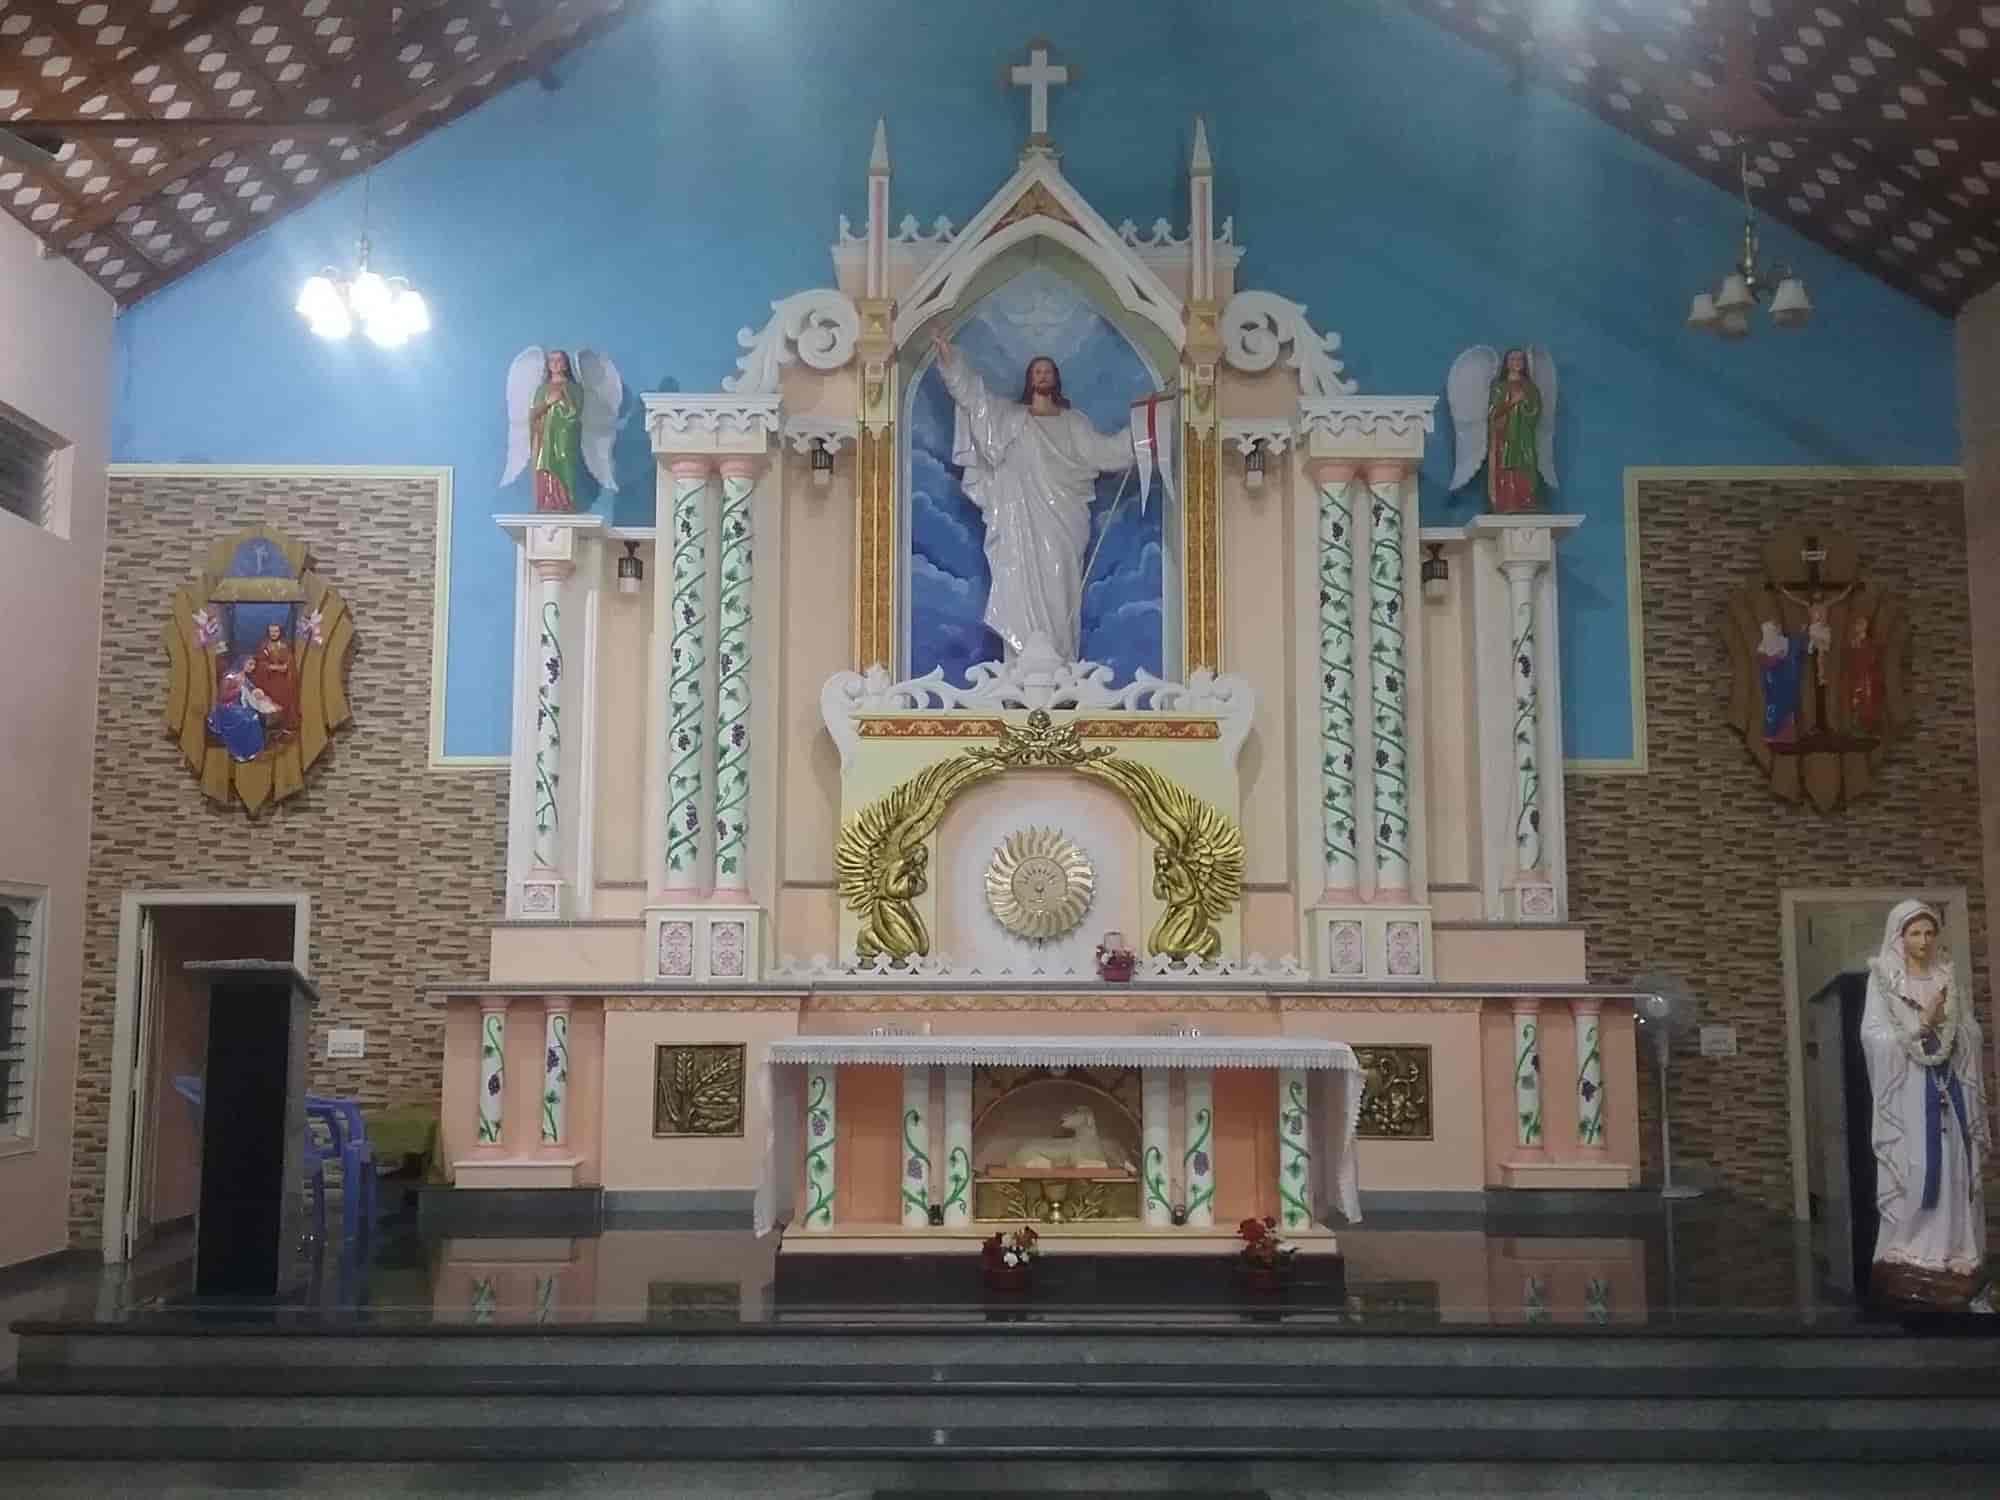 ... Interior Design For Church   Bosco Decor   Church Interiors Photos,  South Chittoor, Ernakulam